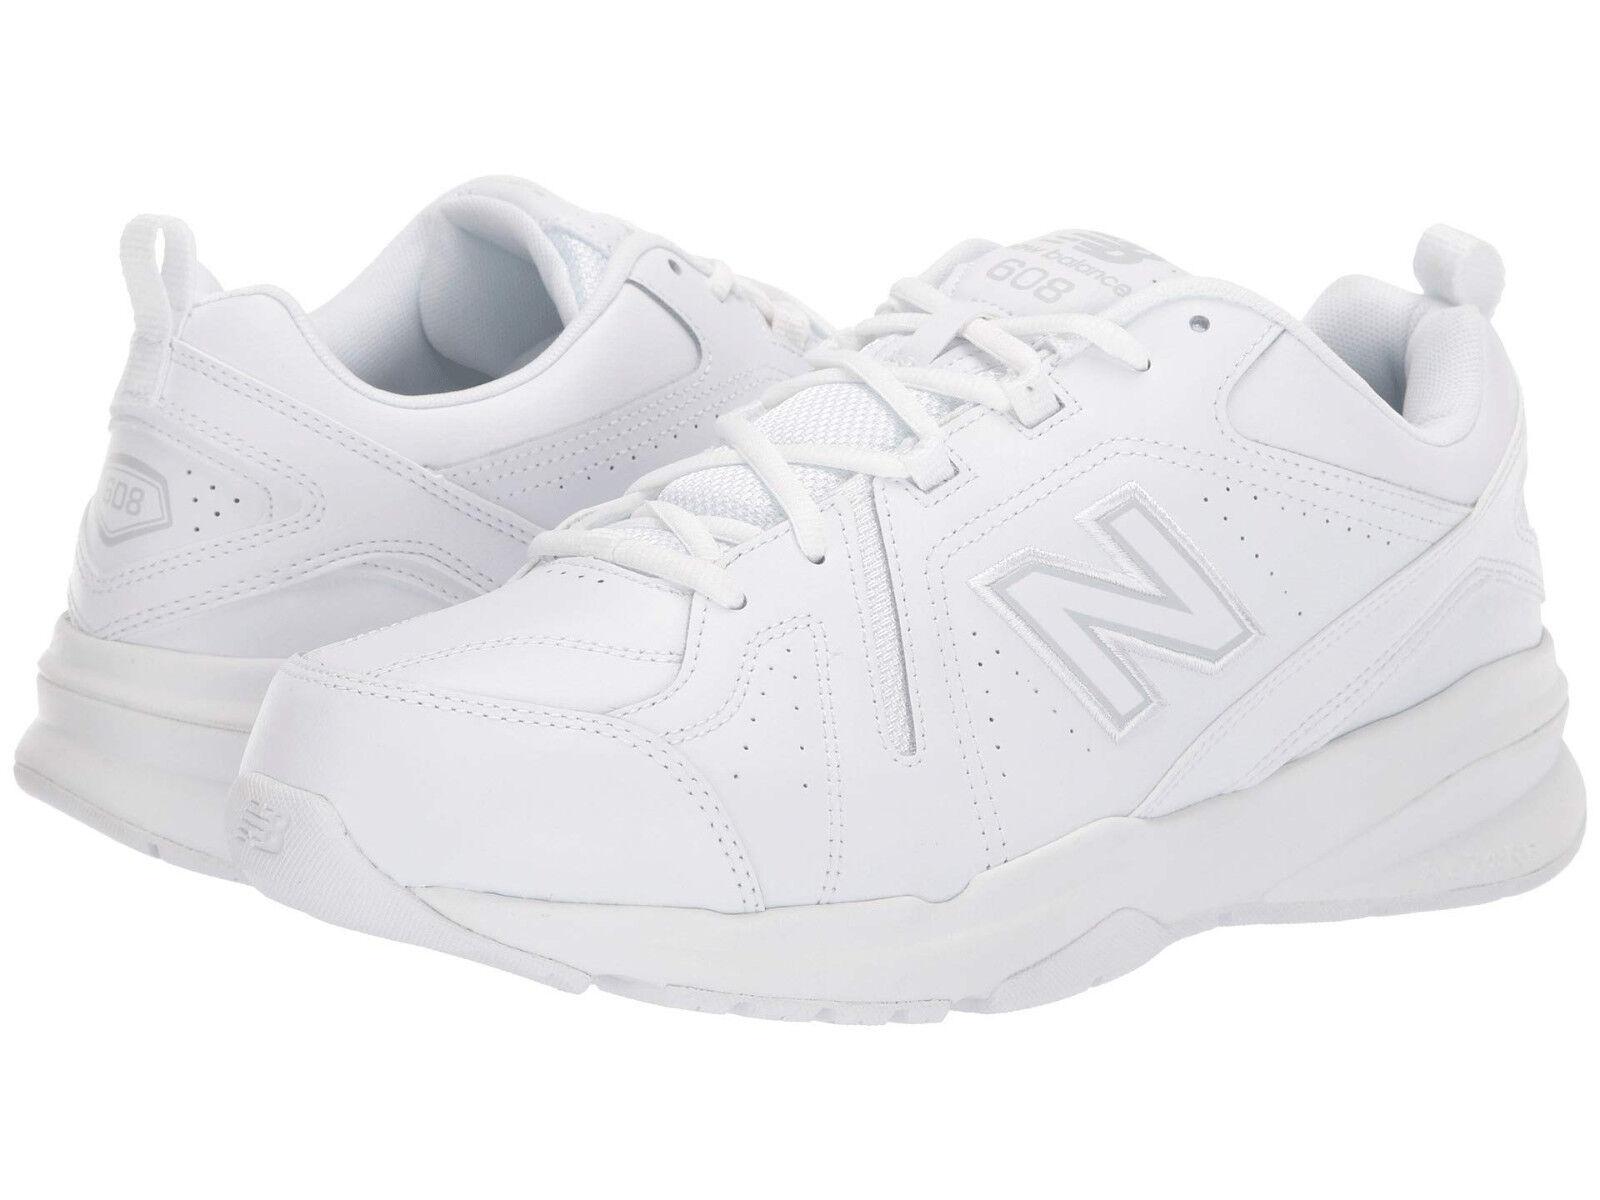 Hombres MX608AW5 Caminar Cuero New Balance Extra Ancho 4E blancooo blancooo 100% Original